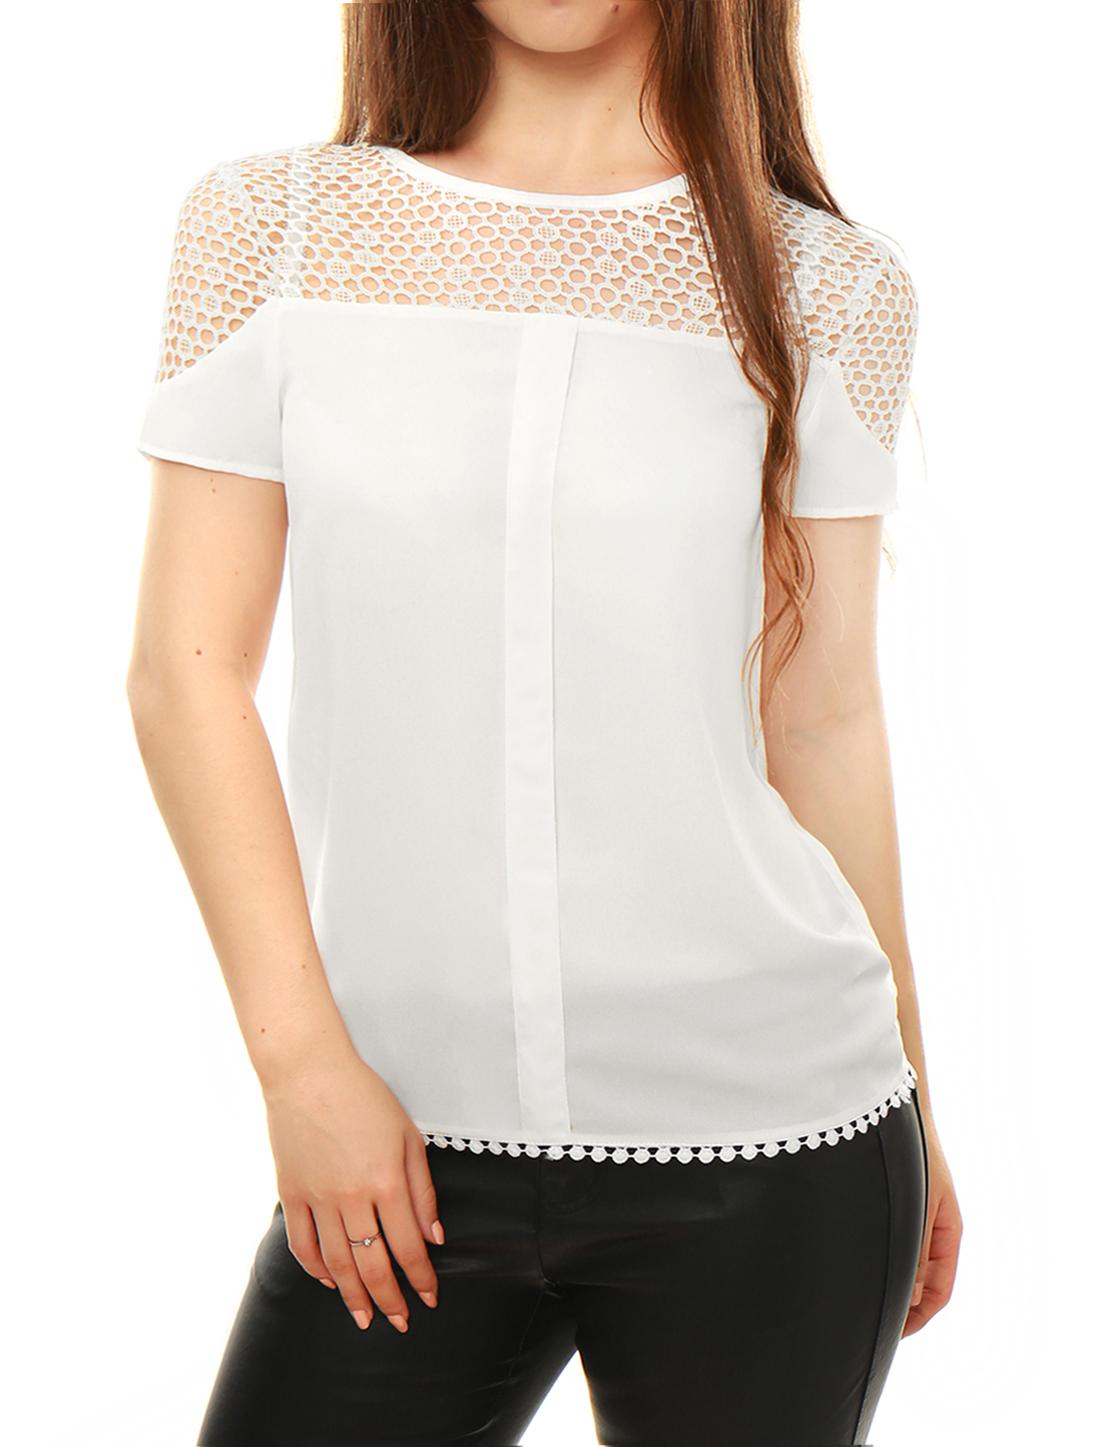 Allegra K Ladies Short Sleeve Round Neck Casual Top T-Shirt XS